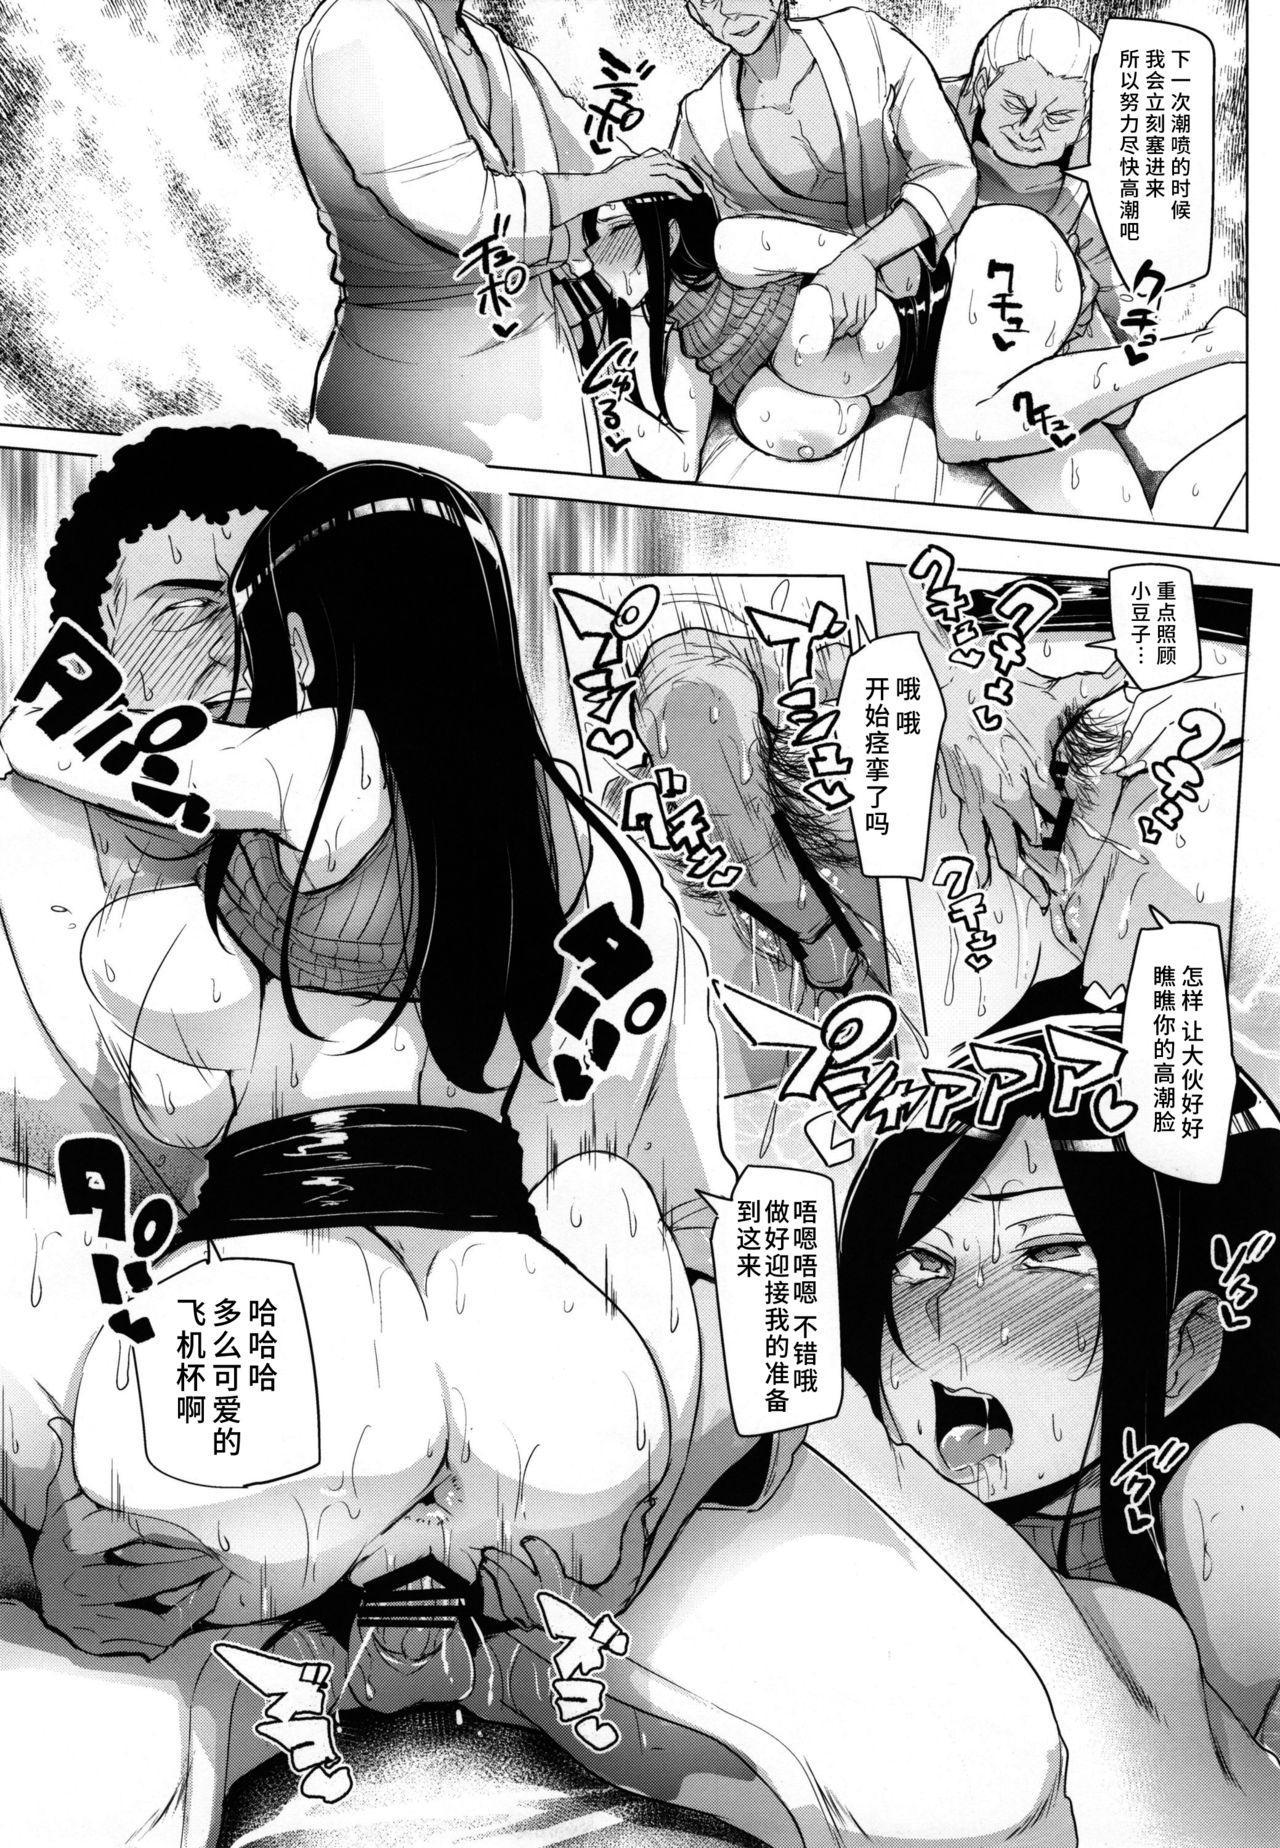 Shinai Max Mattanashi! 3 | Max Affection System! 3 24